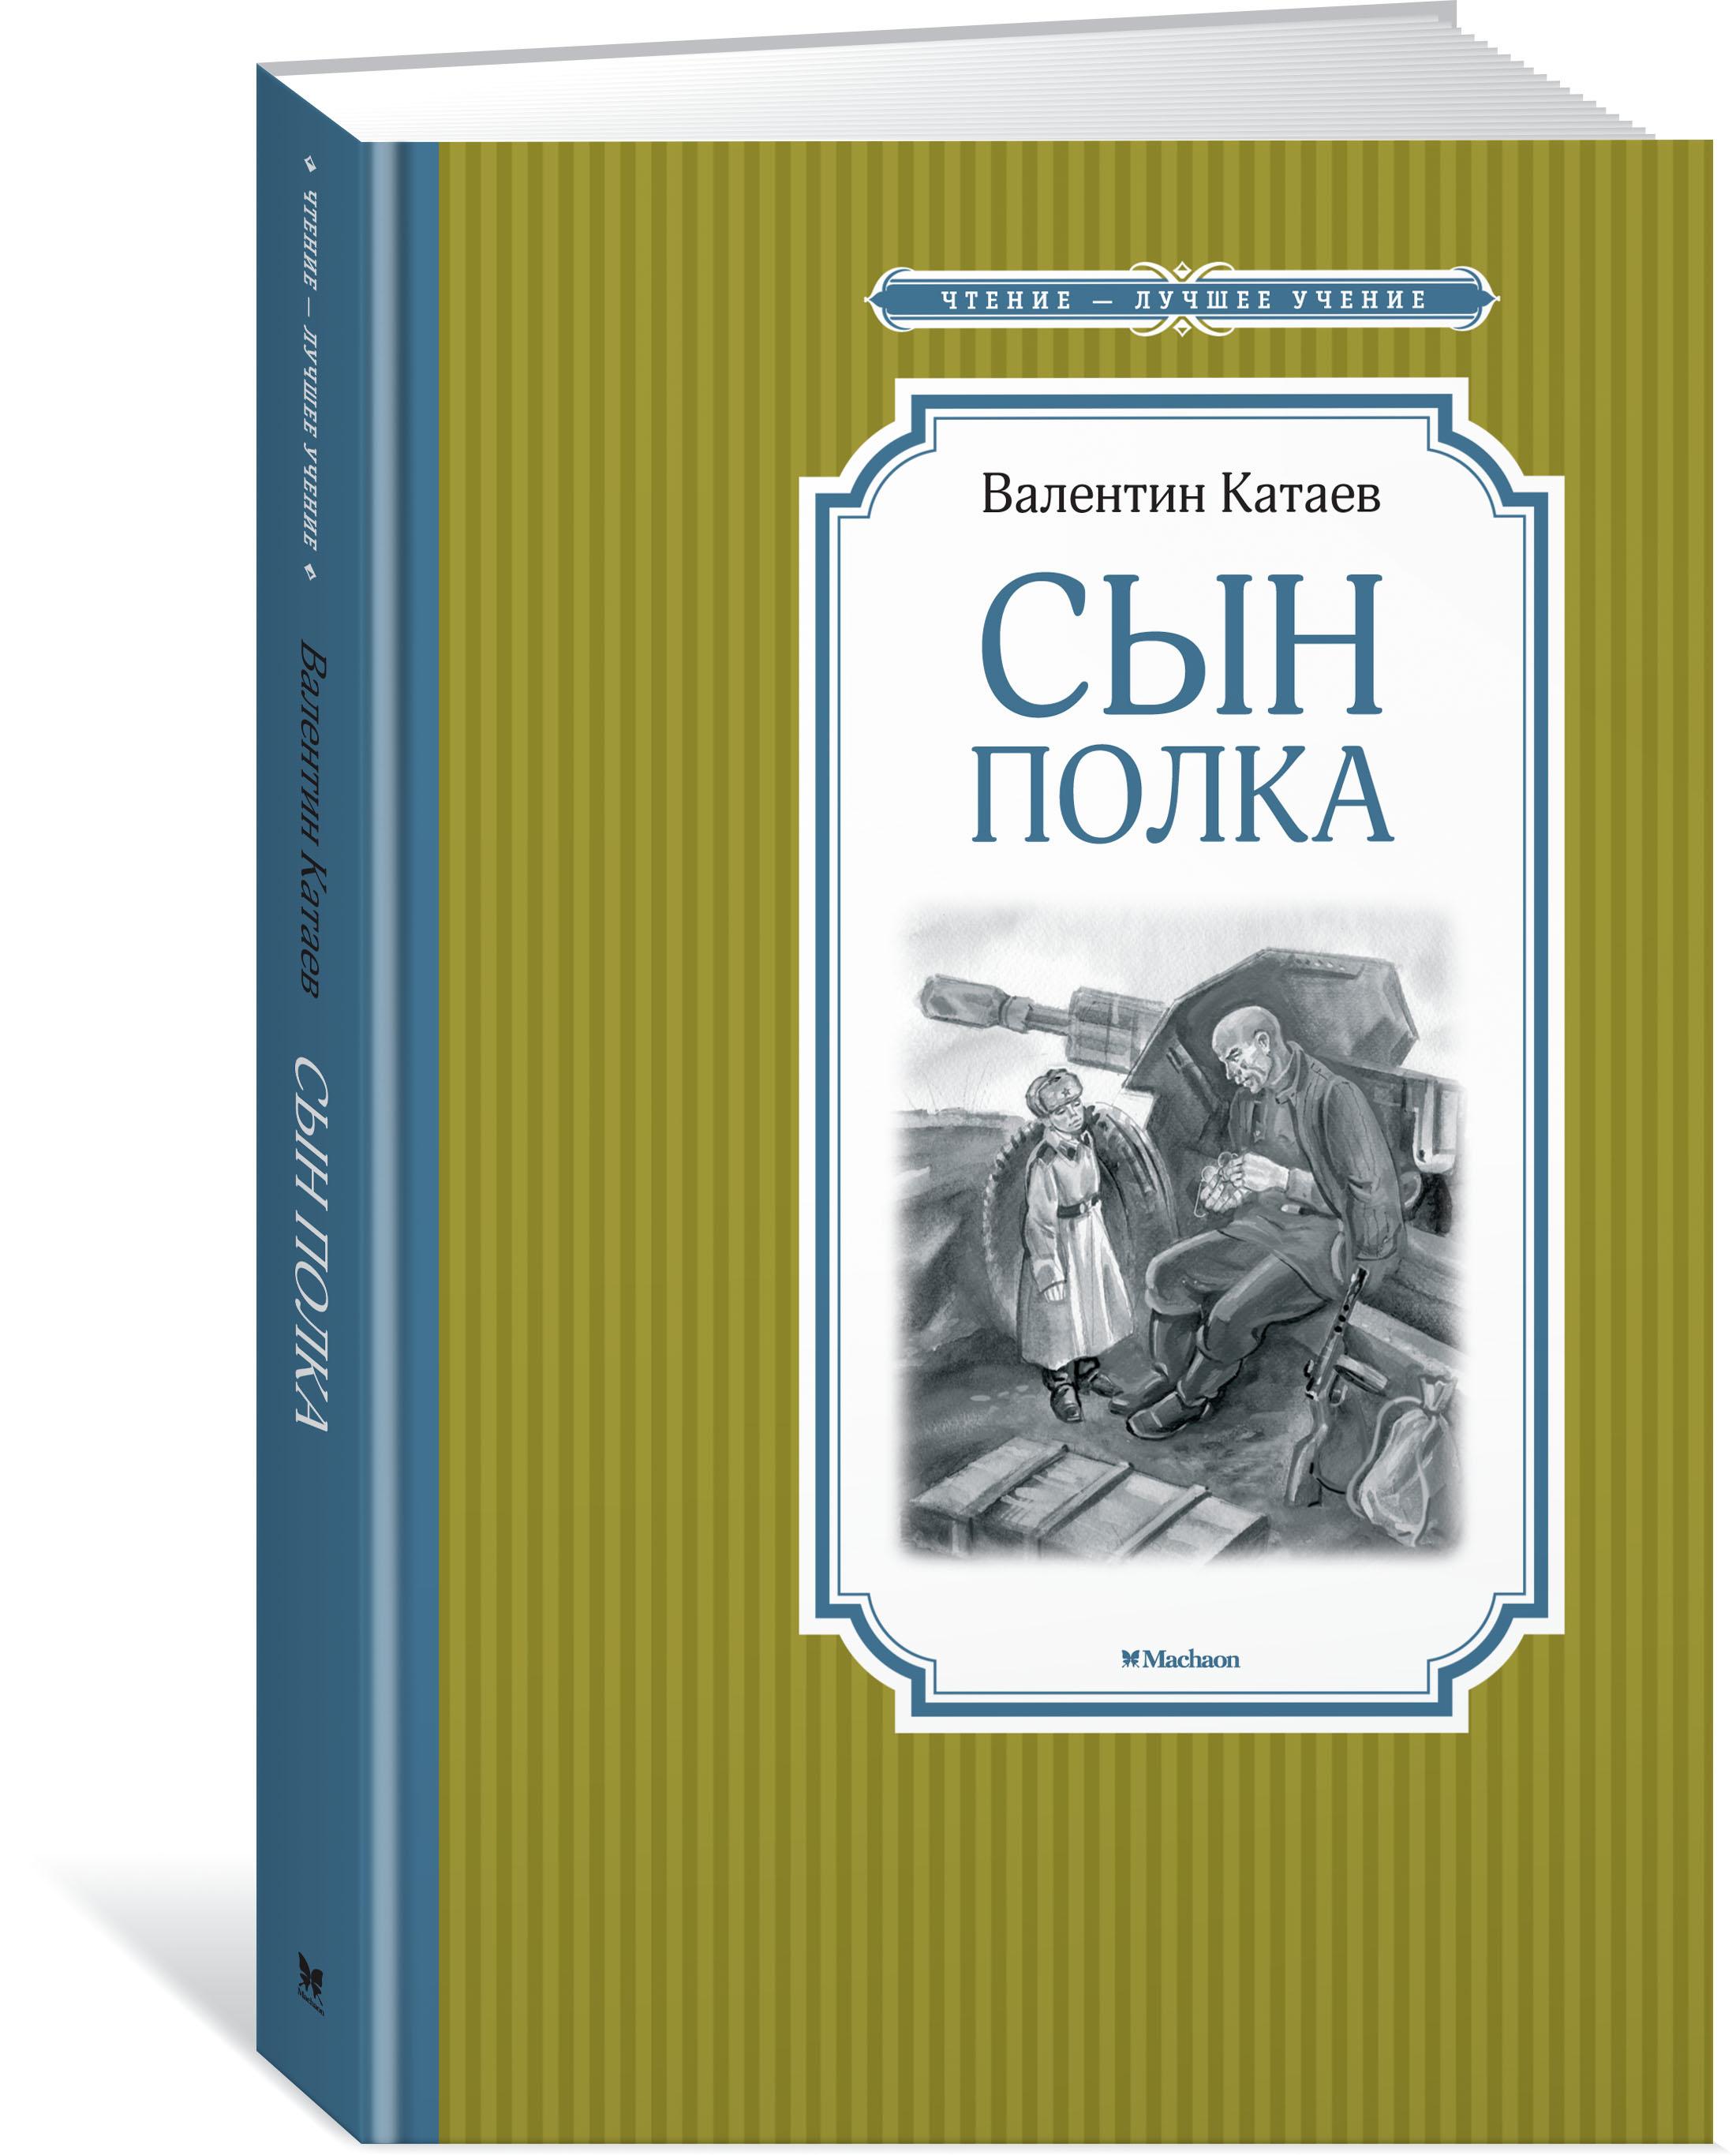 Валентин Катаев Сын полка катаев валентин петрович сын полка